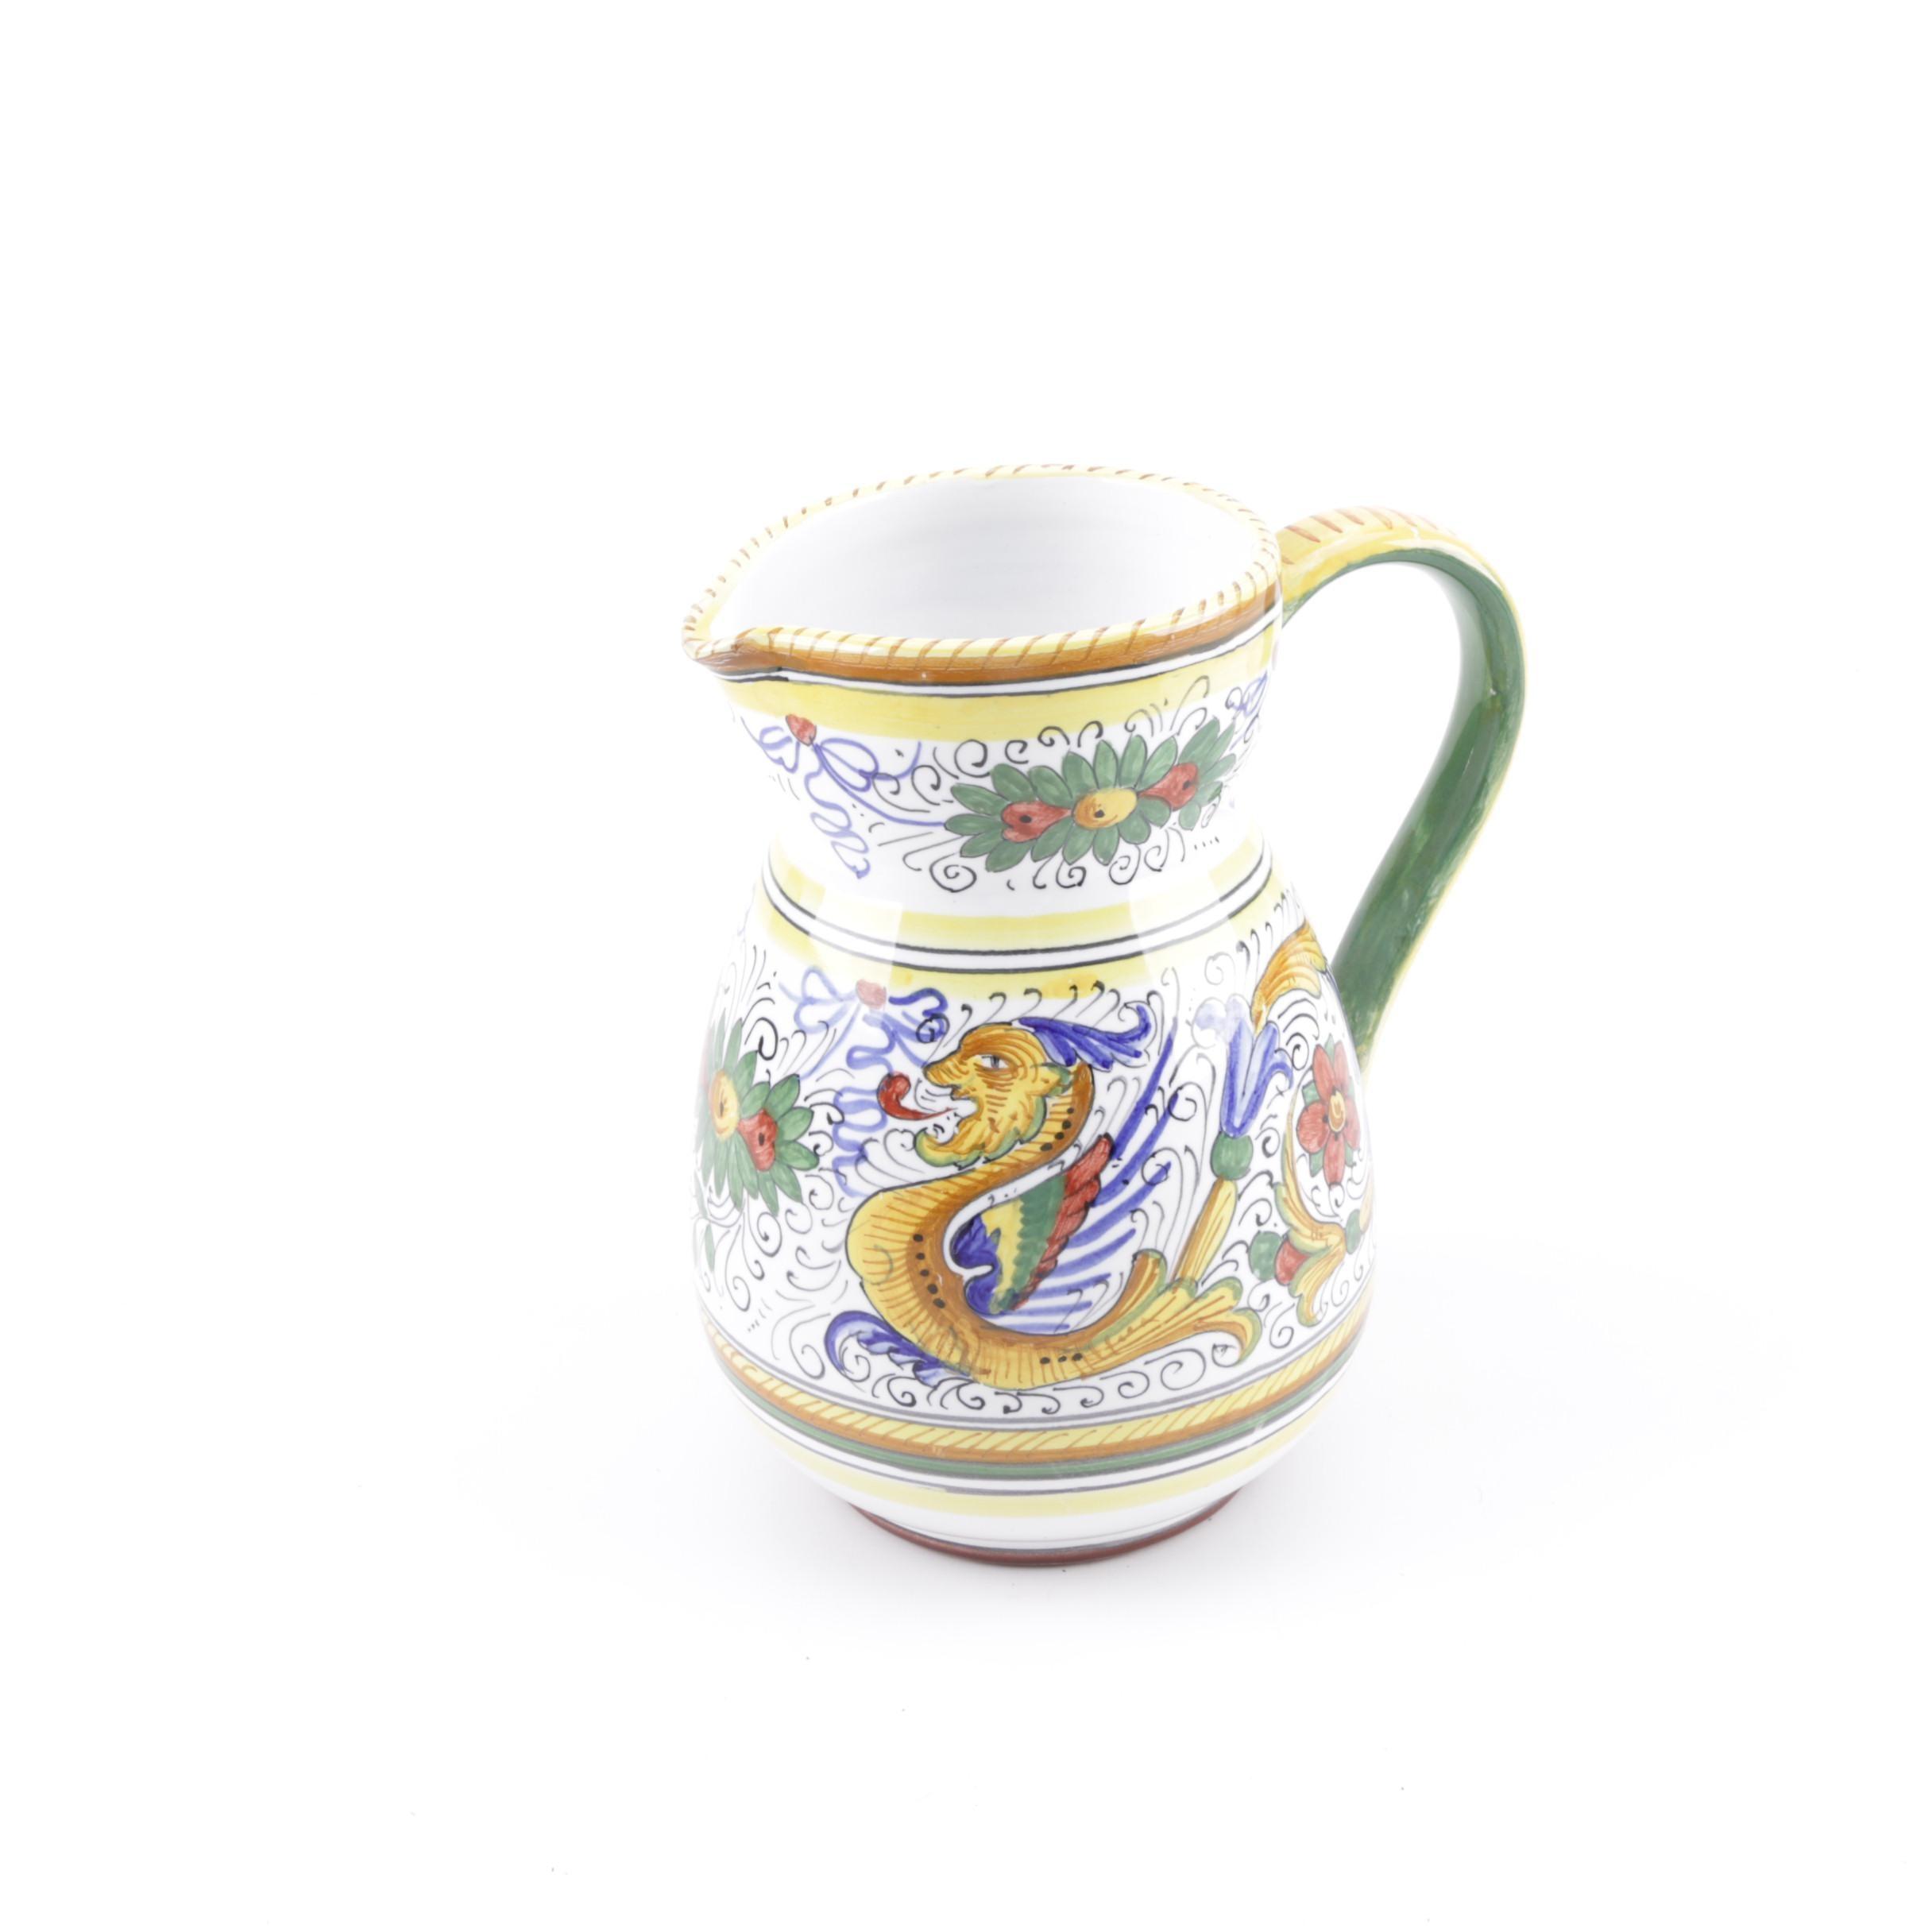 Fima Deruta Italian Pottery Pitcher